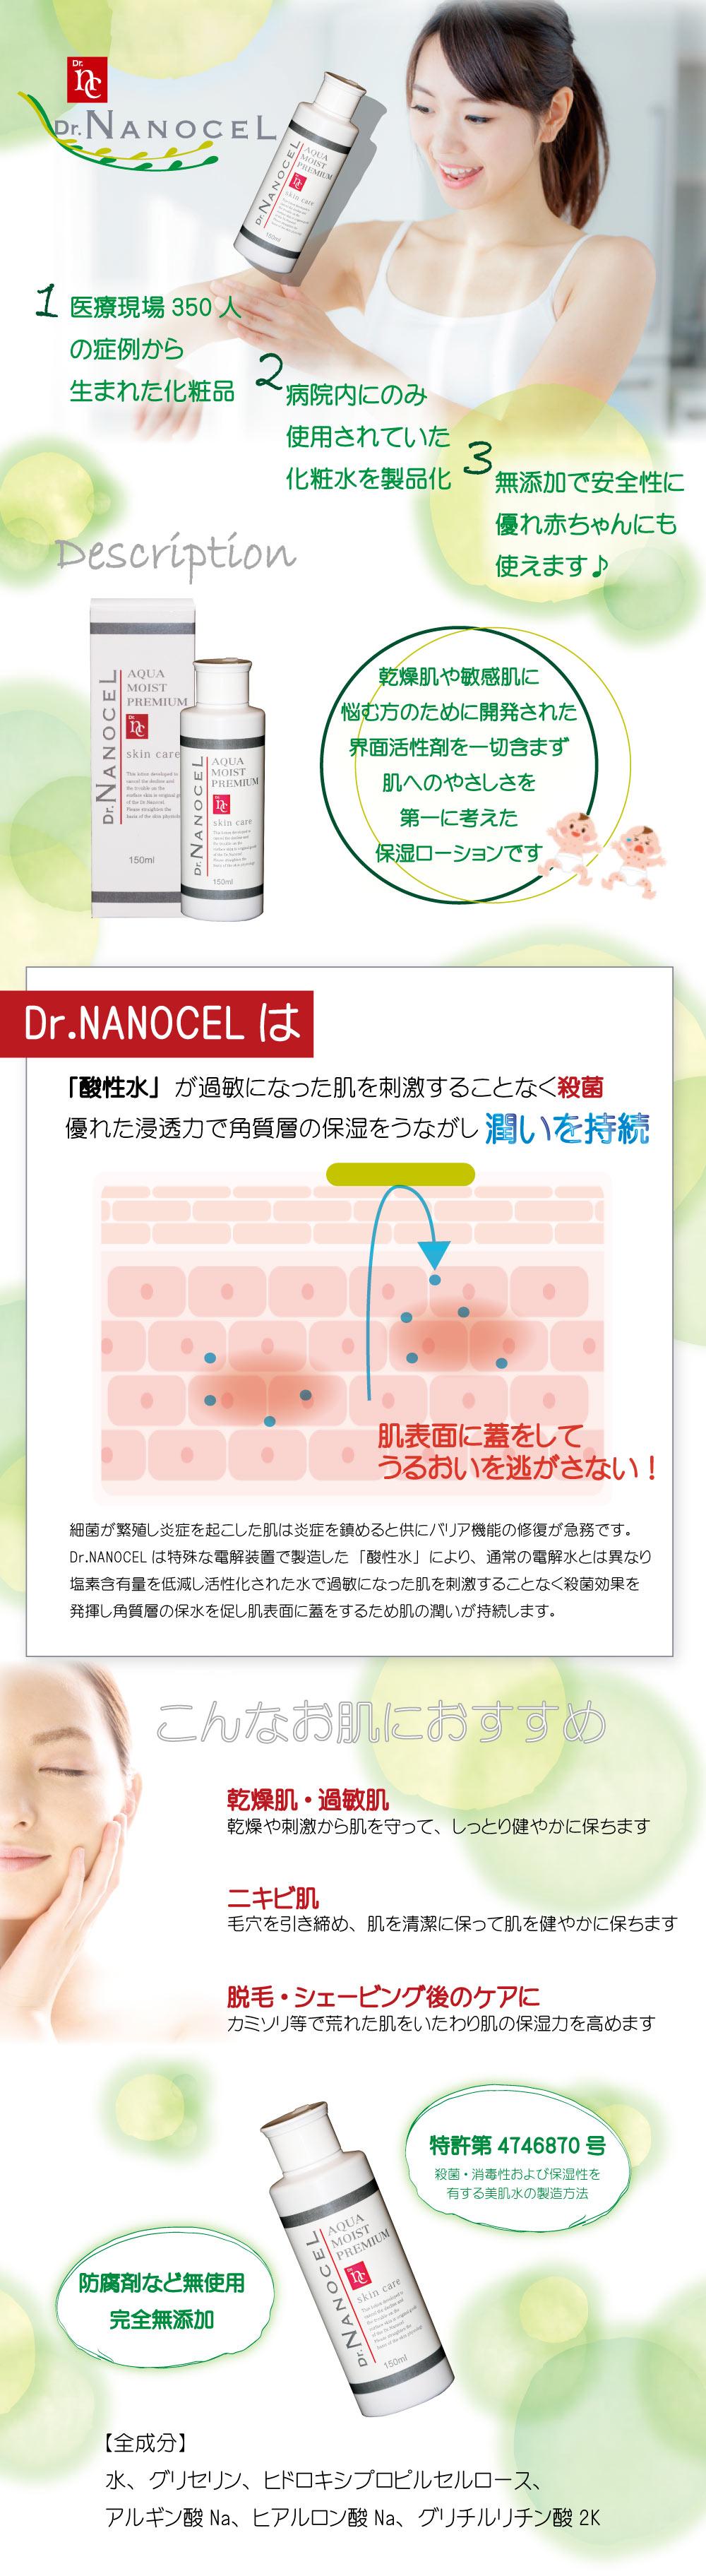 Nanoceldescription